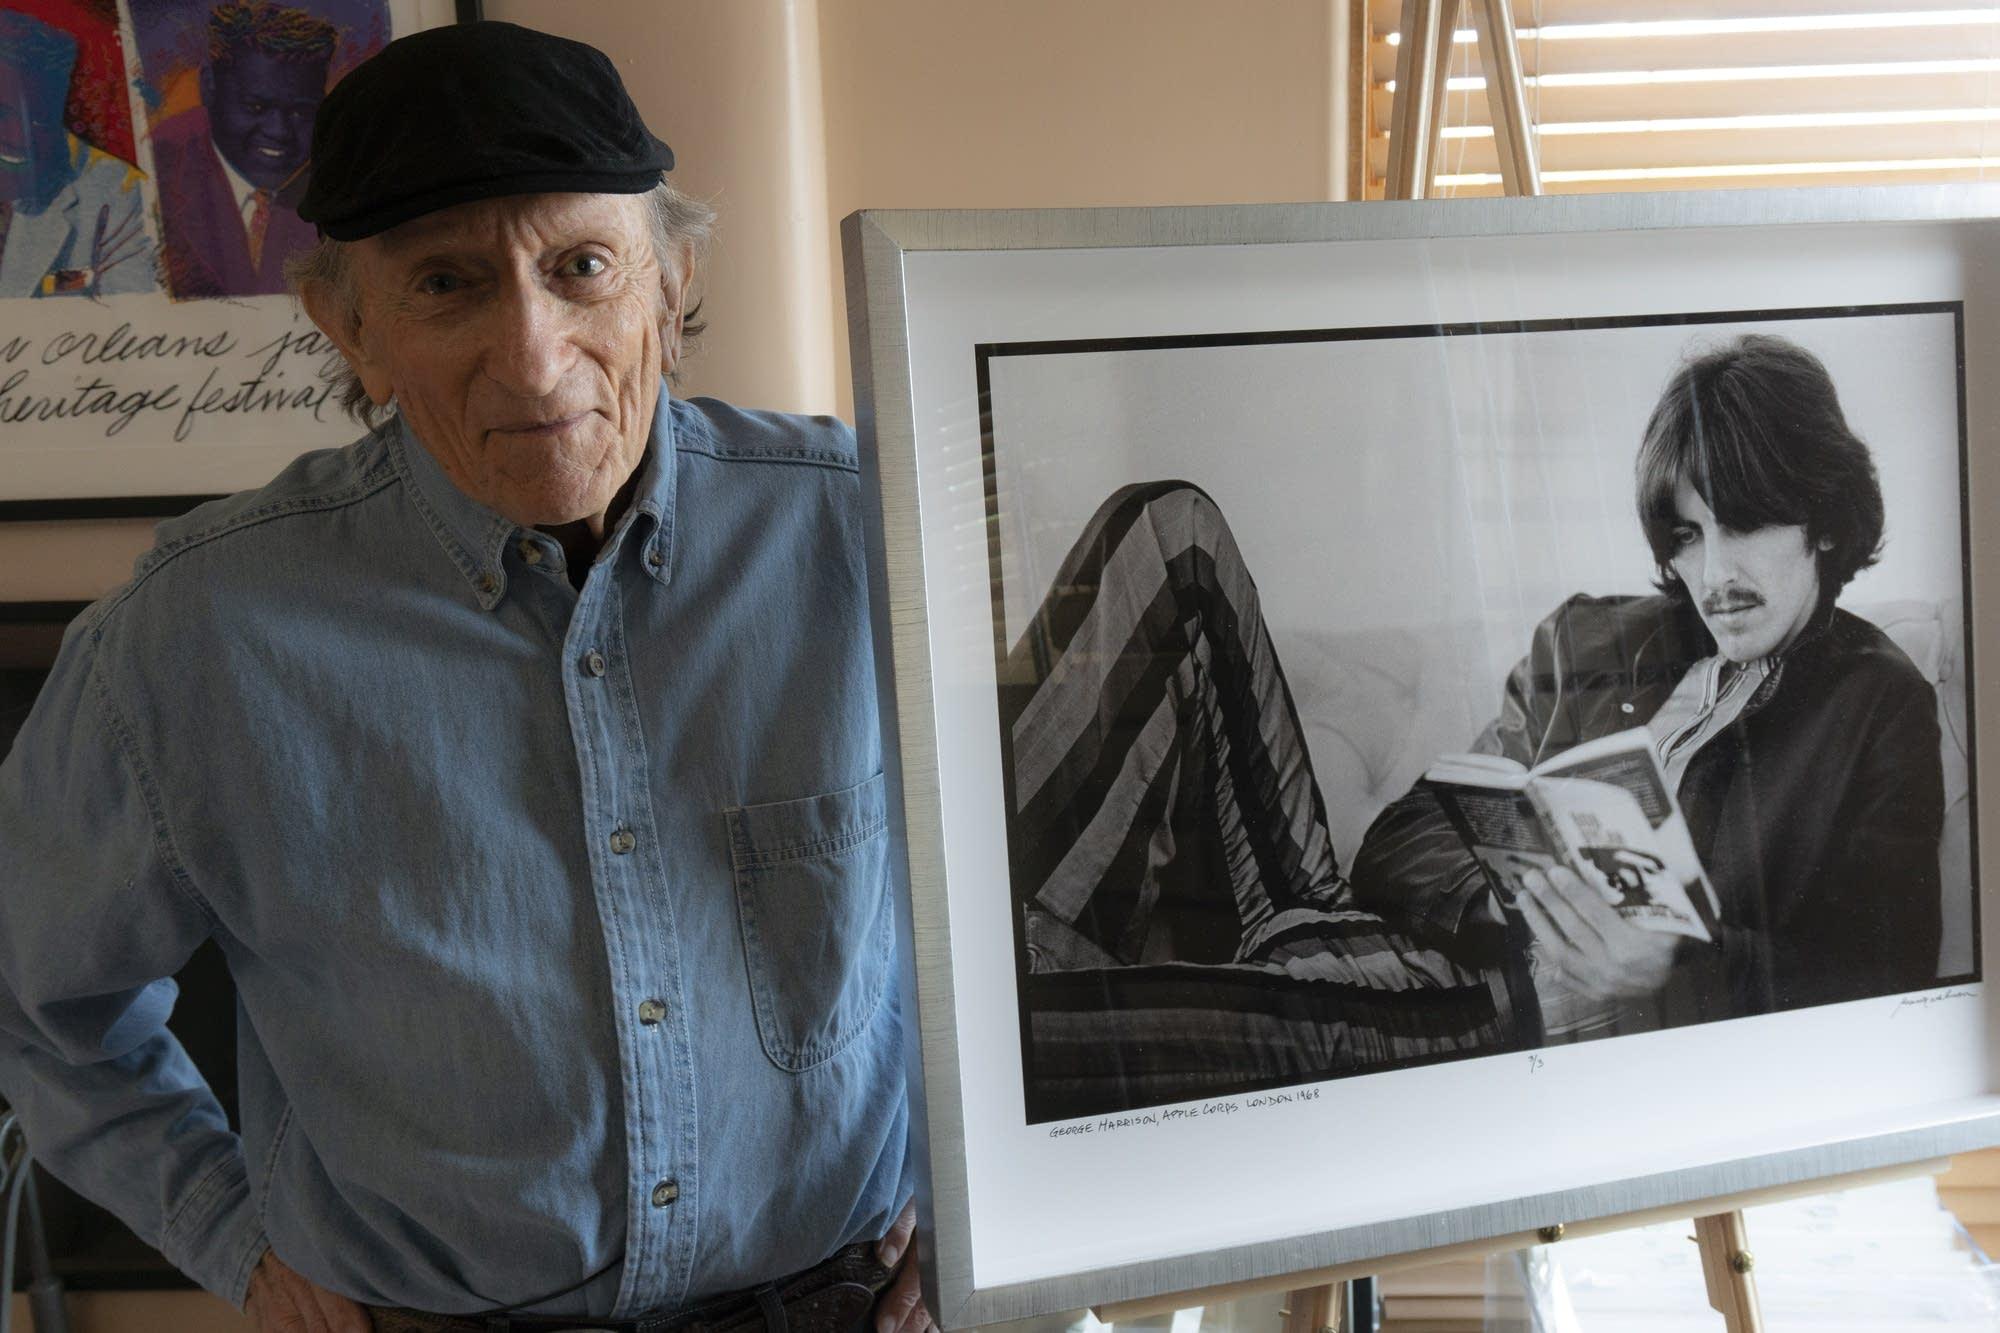 Photographer Baron Wolman with photo of George Harrison